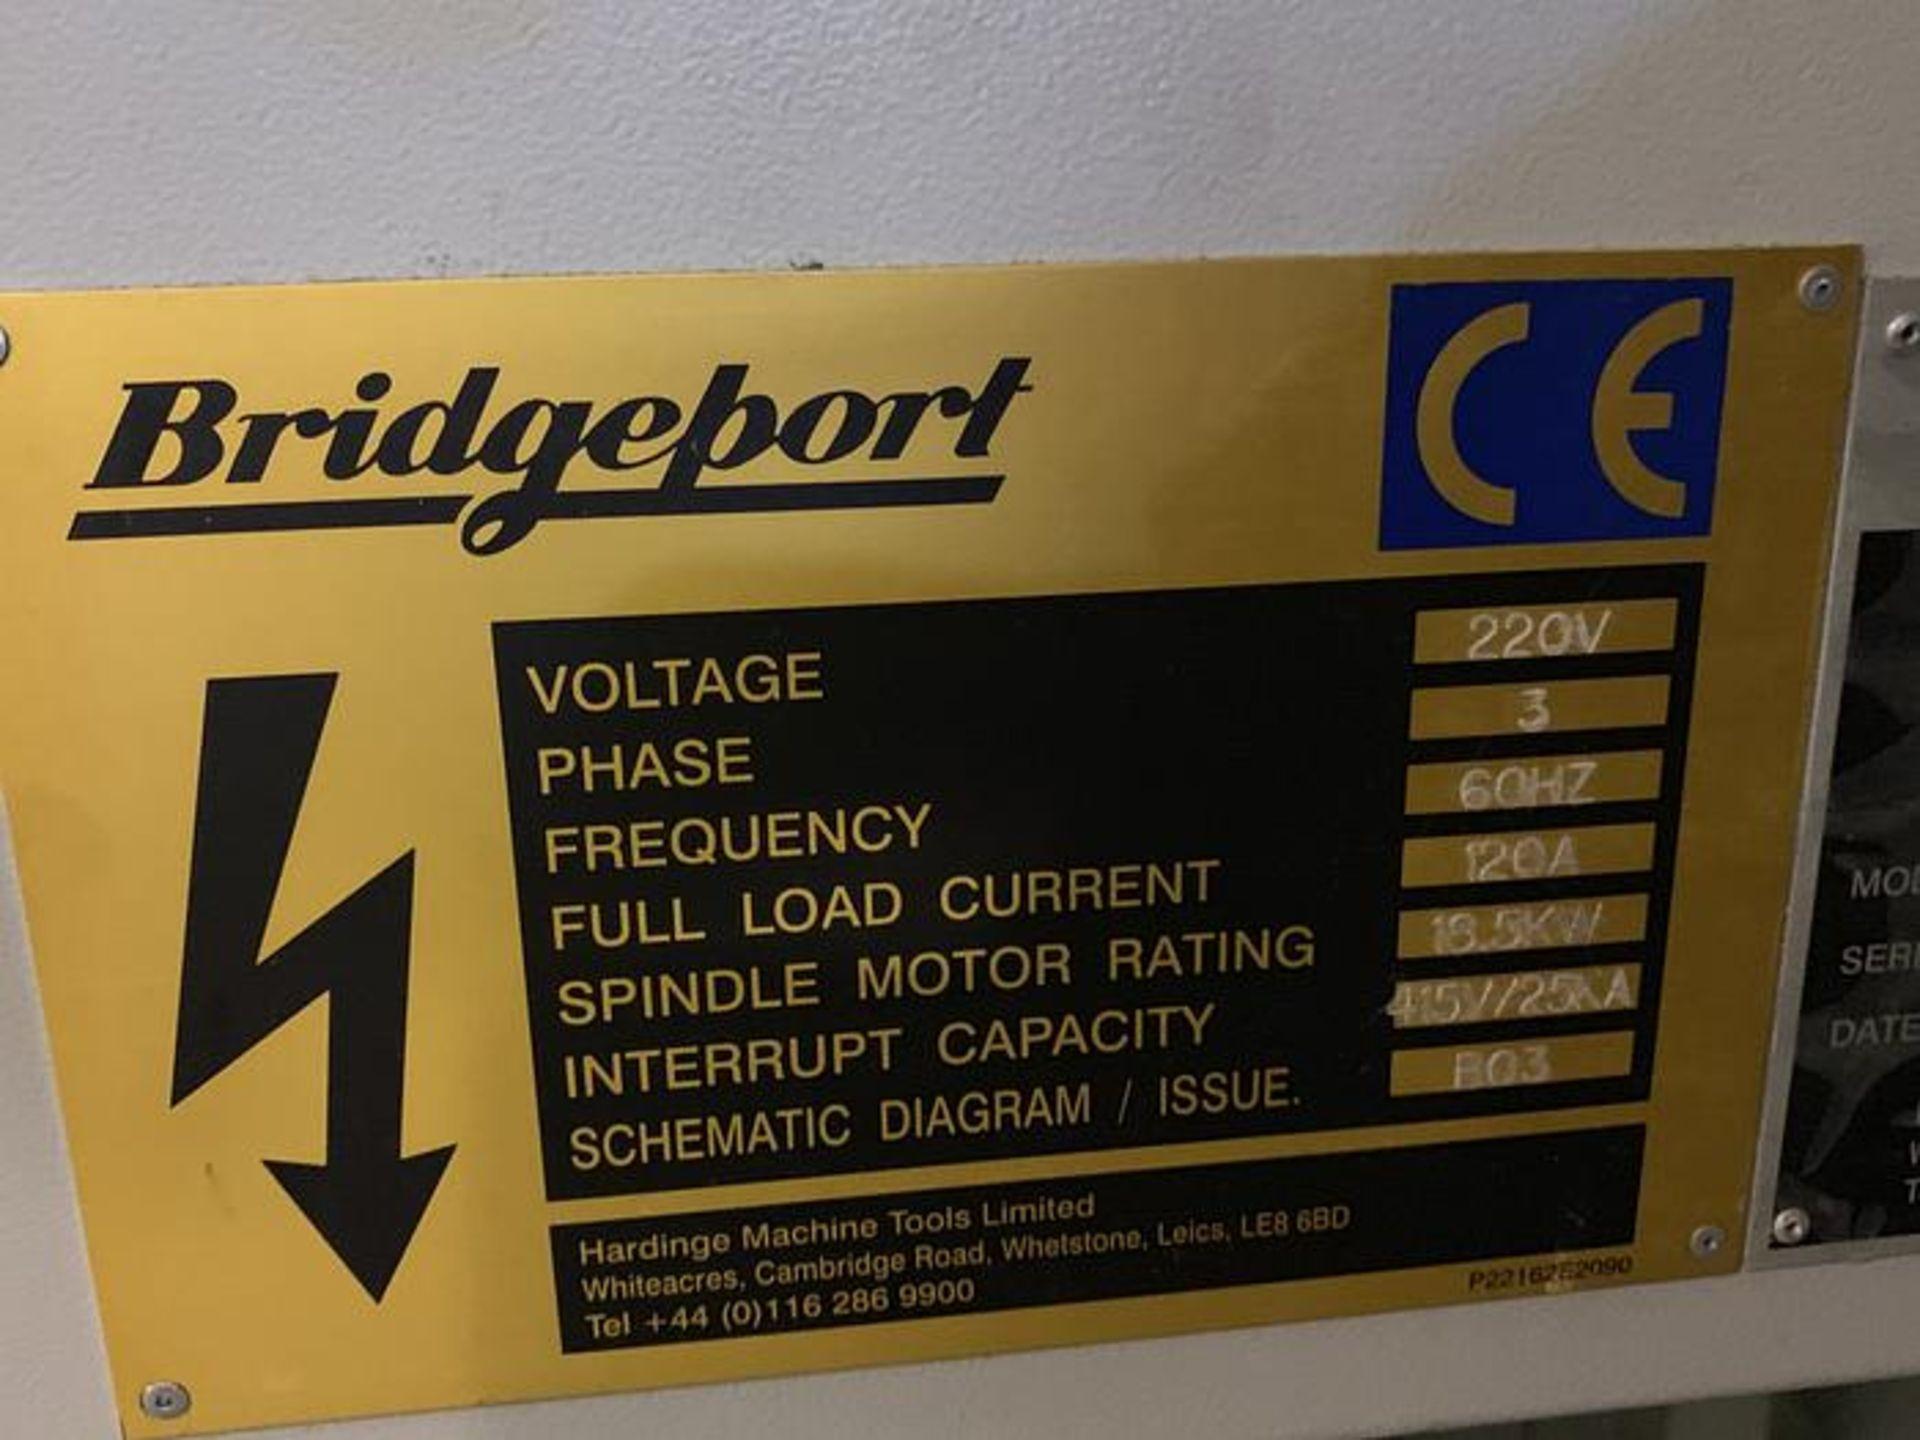 "HARDINGE BRIDGEPORT XR760 CNC VMC PRODUCTION CENTER 30""X24""X24"". YEAR 2007, SN 310D418 - Image 13 of 16"